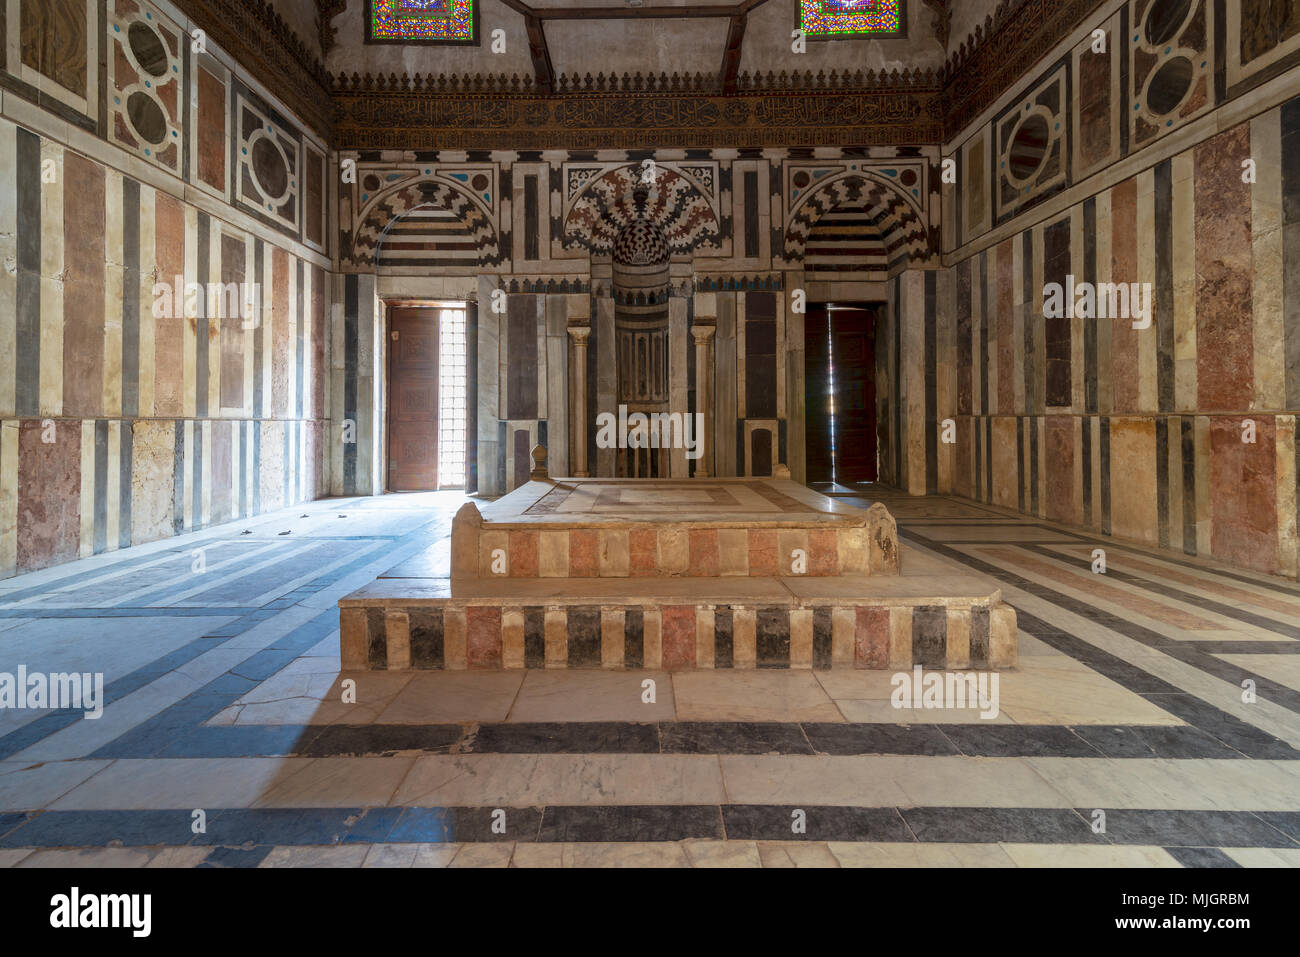 Front view of Mausoleum of Sultan Al Zahir Barquq at the Barquq complex located at al Muiz Street, Islamic Cairo, Egypt - Stock Image